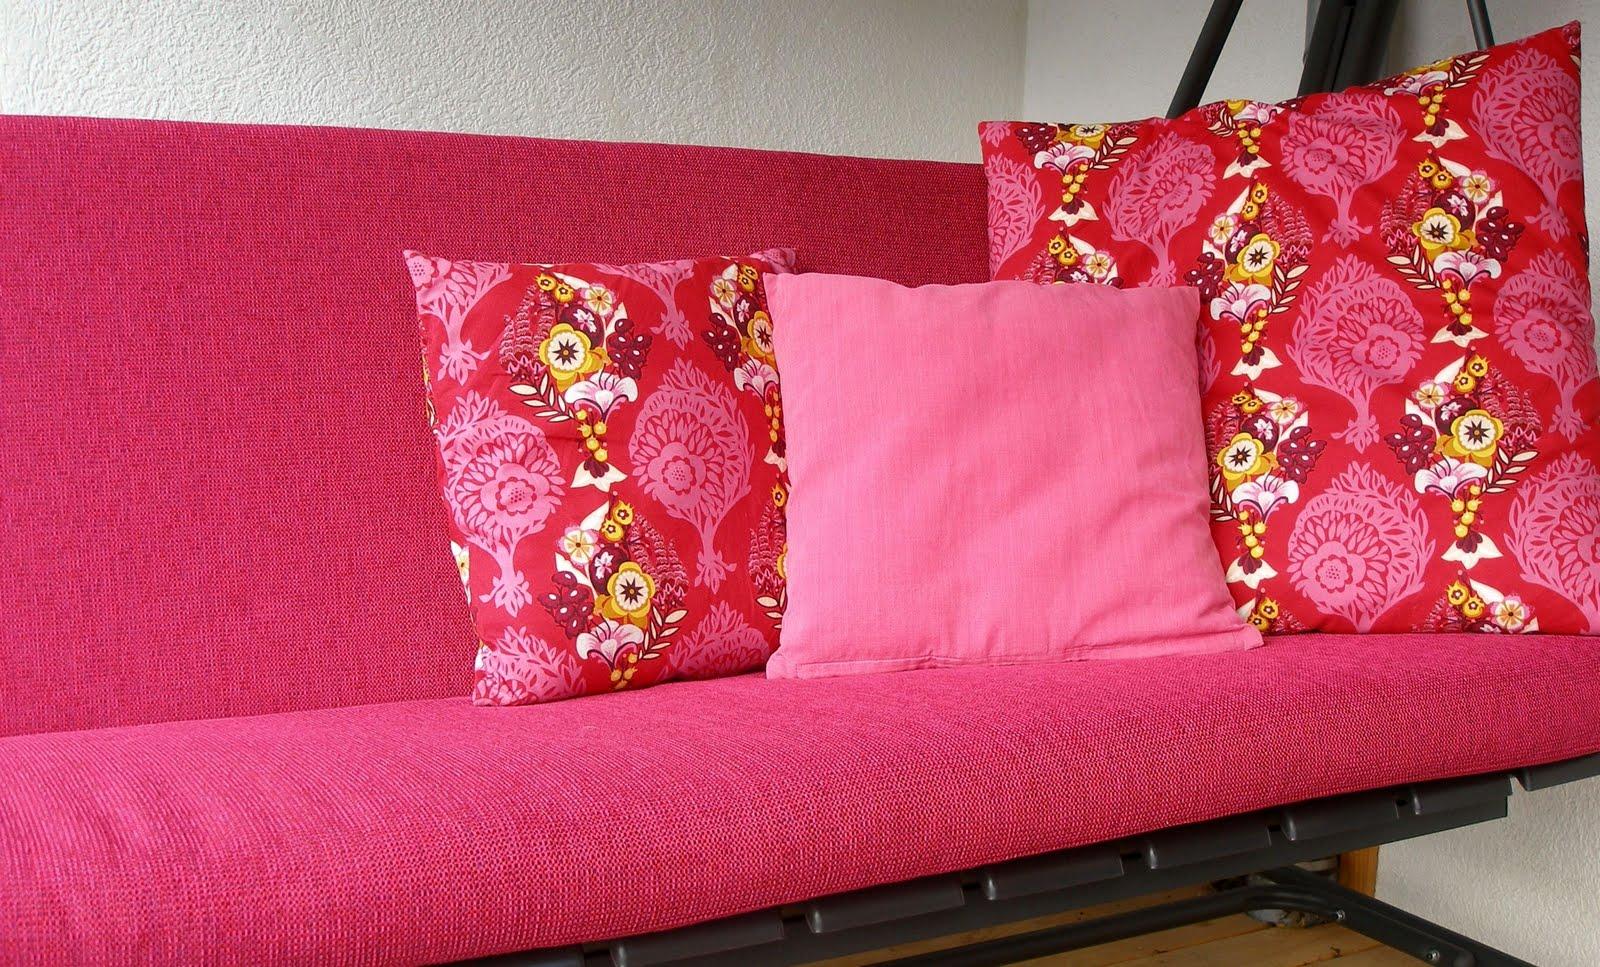 polsterkissen f r schaukel. Black Bedroom Furniture Sets. Home Design Ideas